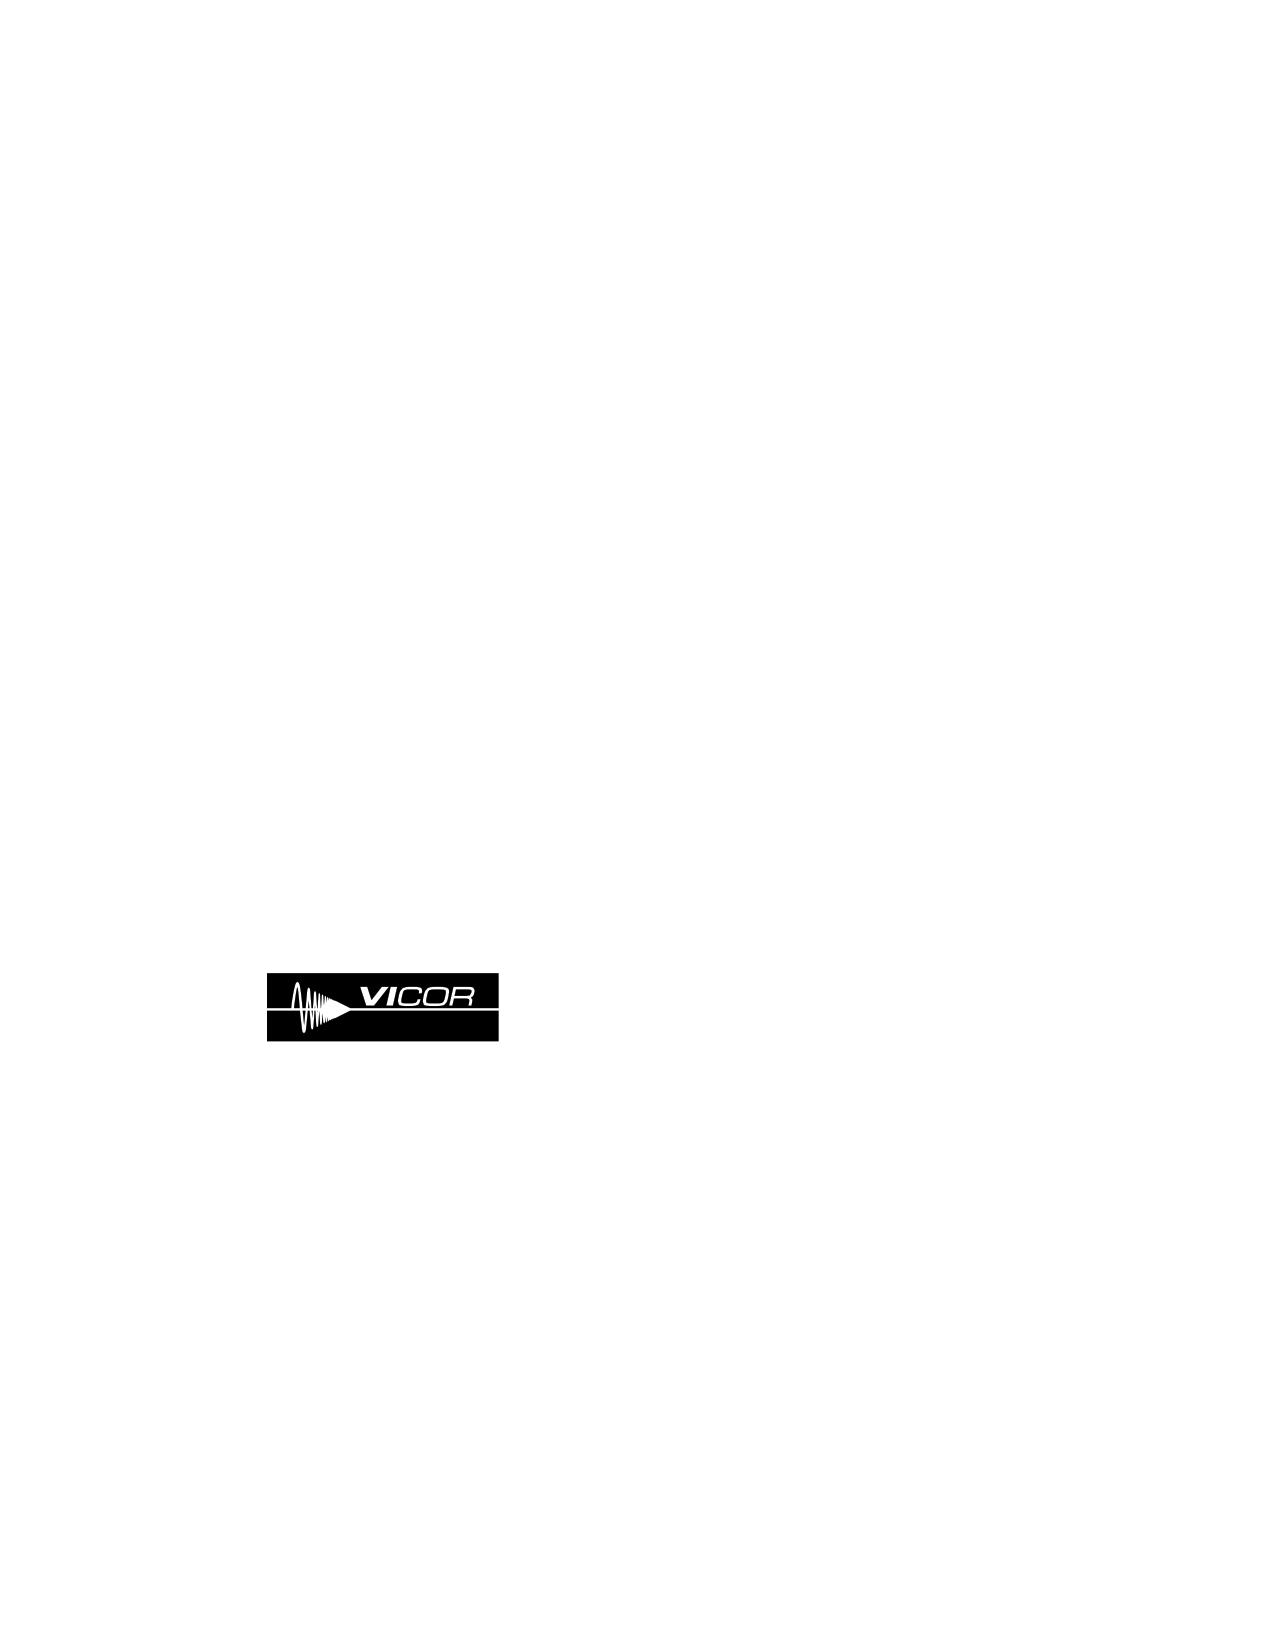 M-FIAM5HN3 pdf